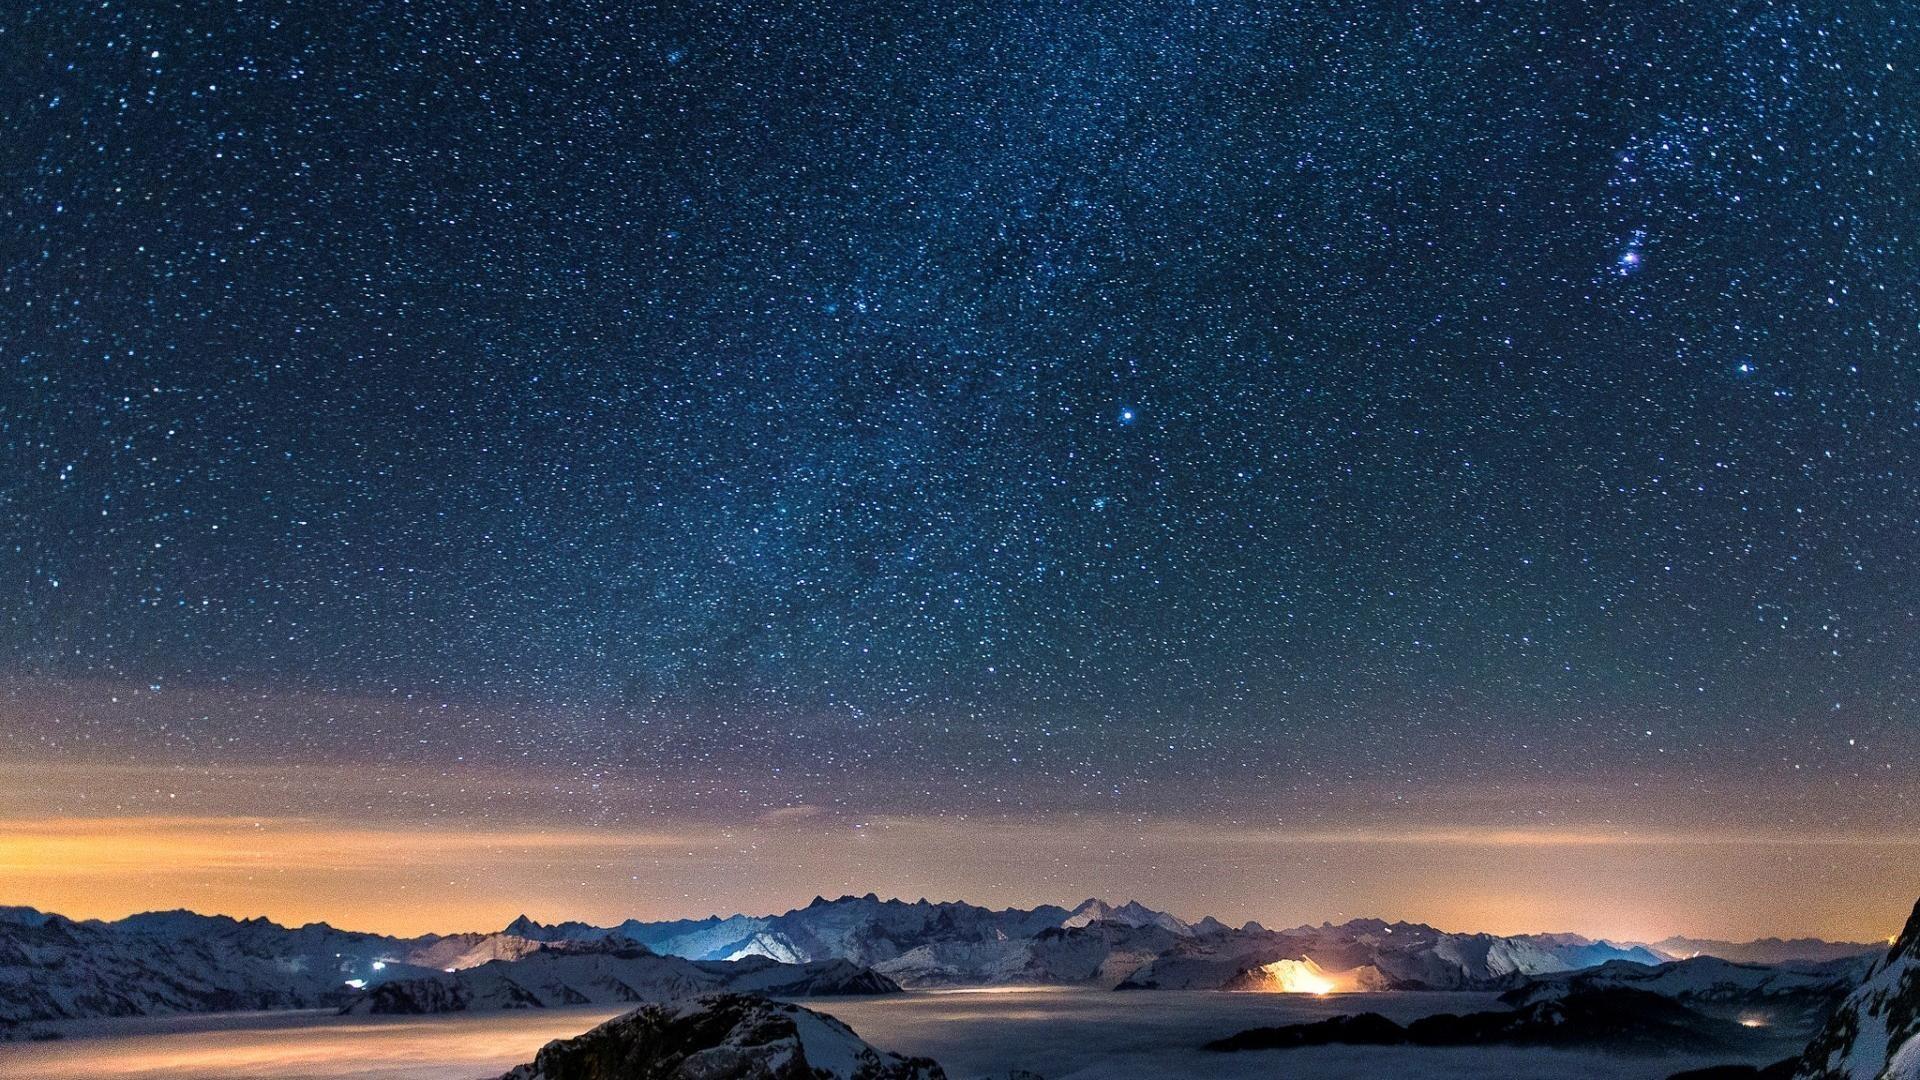 Snow stars wall night sky wallpaper | (59391)